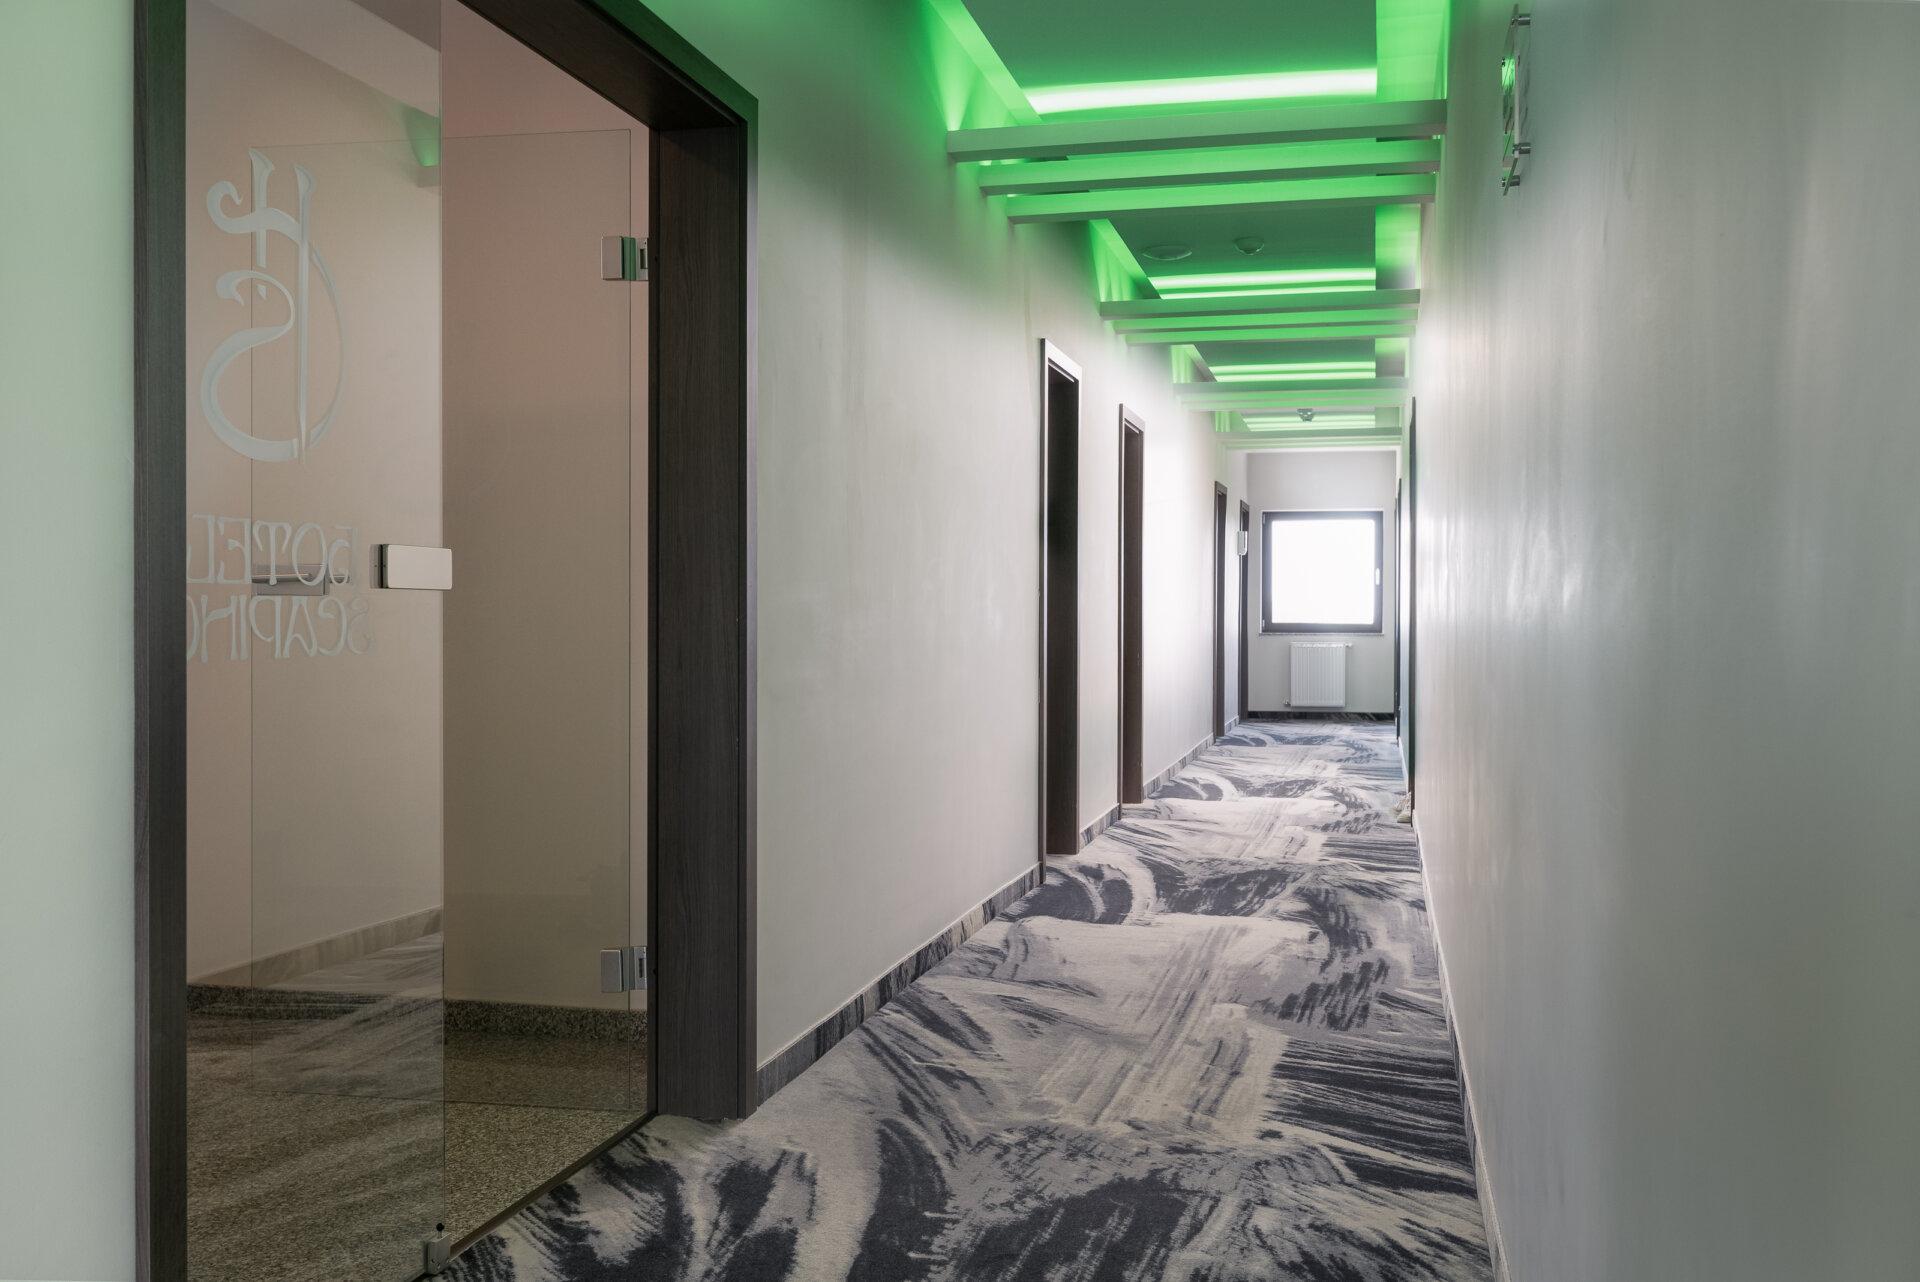 20210524-carpet&more-mamaia-hotel-scapino-by-hugmedia-016